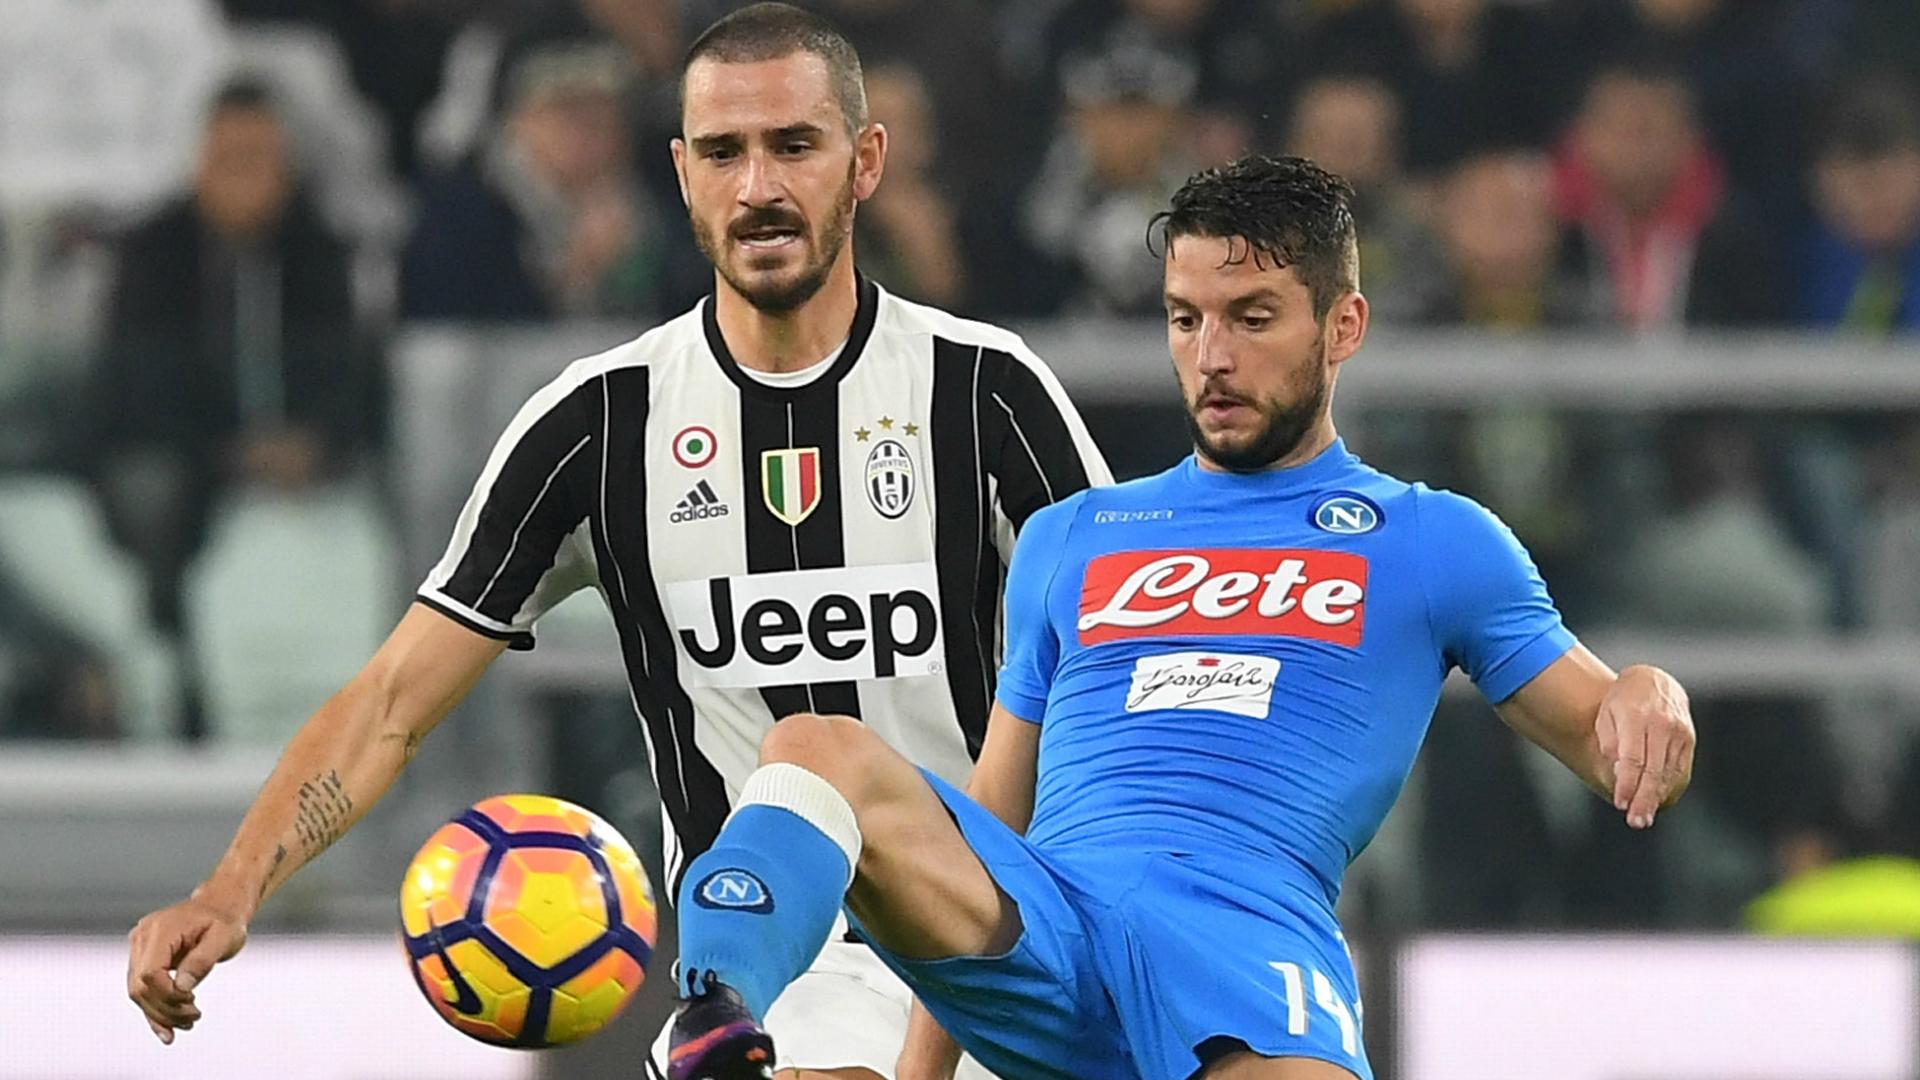 Leonardo Bonucci Dries Mertens Juventus Napoli Serie A 2016-17